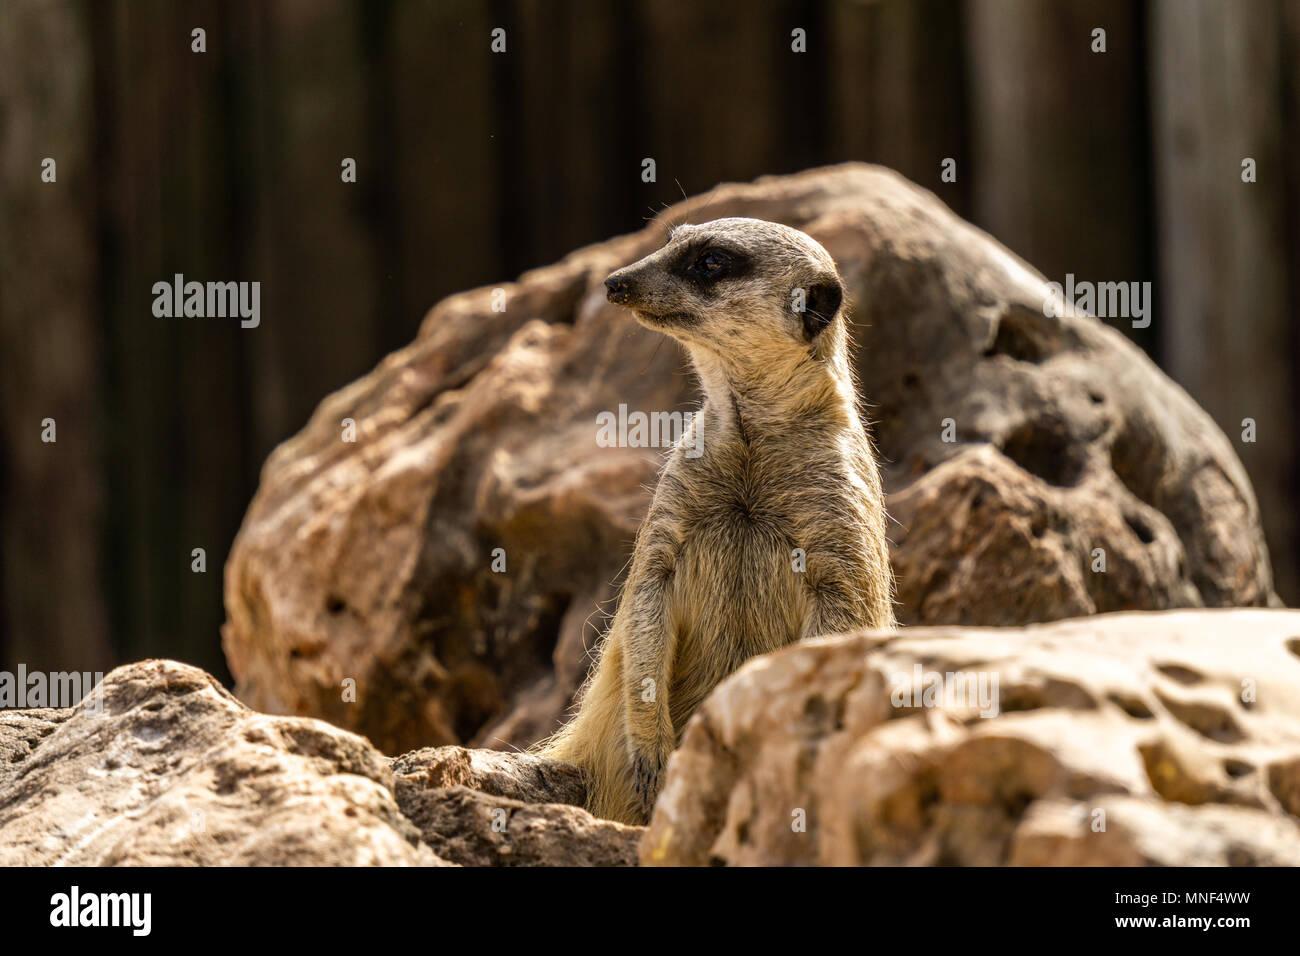 Slender-tailed meerkat Suricata on look out for danger. - Stock Image